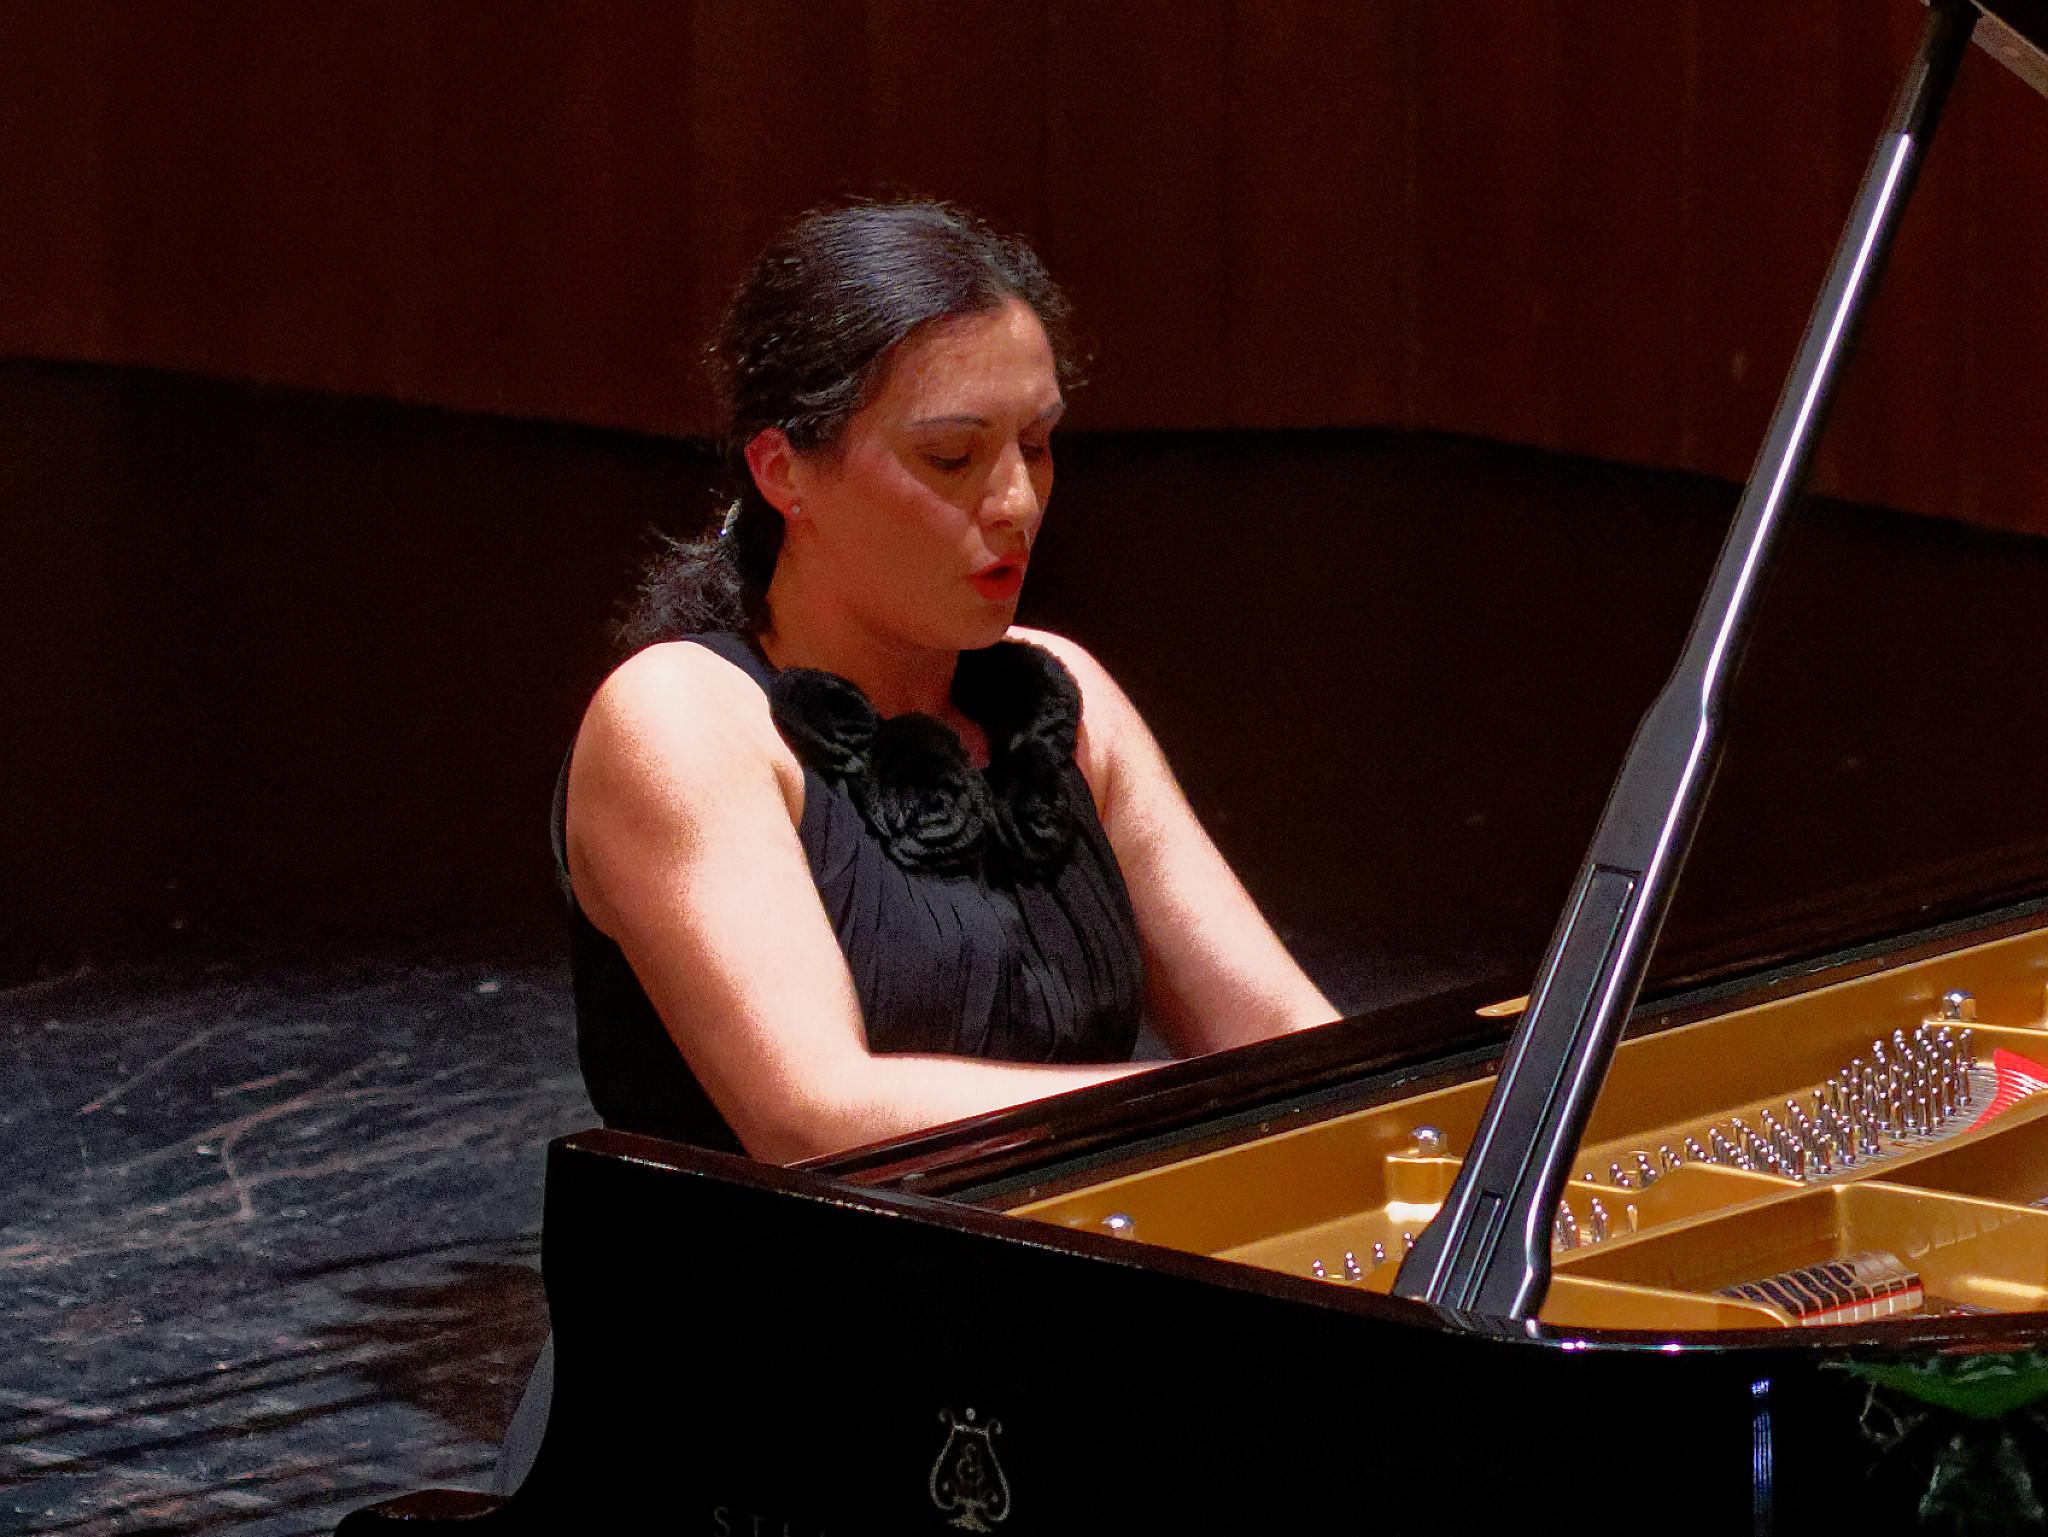 Tamar Beraia @ Klavierissimo Festival, Wetzikon ZH, 2020-01-28 (© Rolf Kyburz)